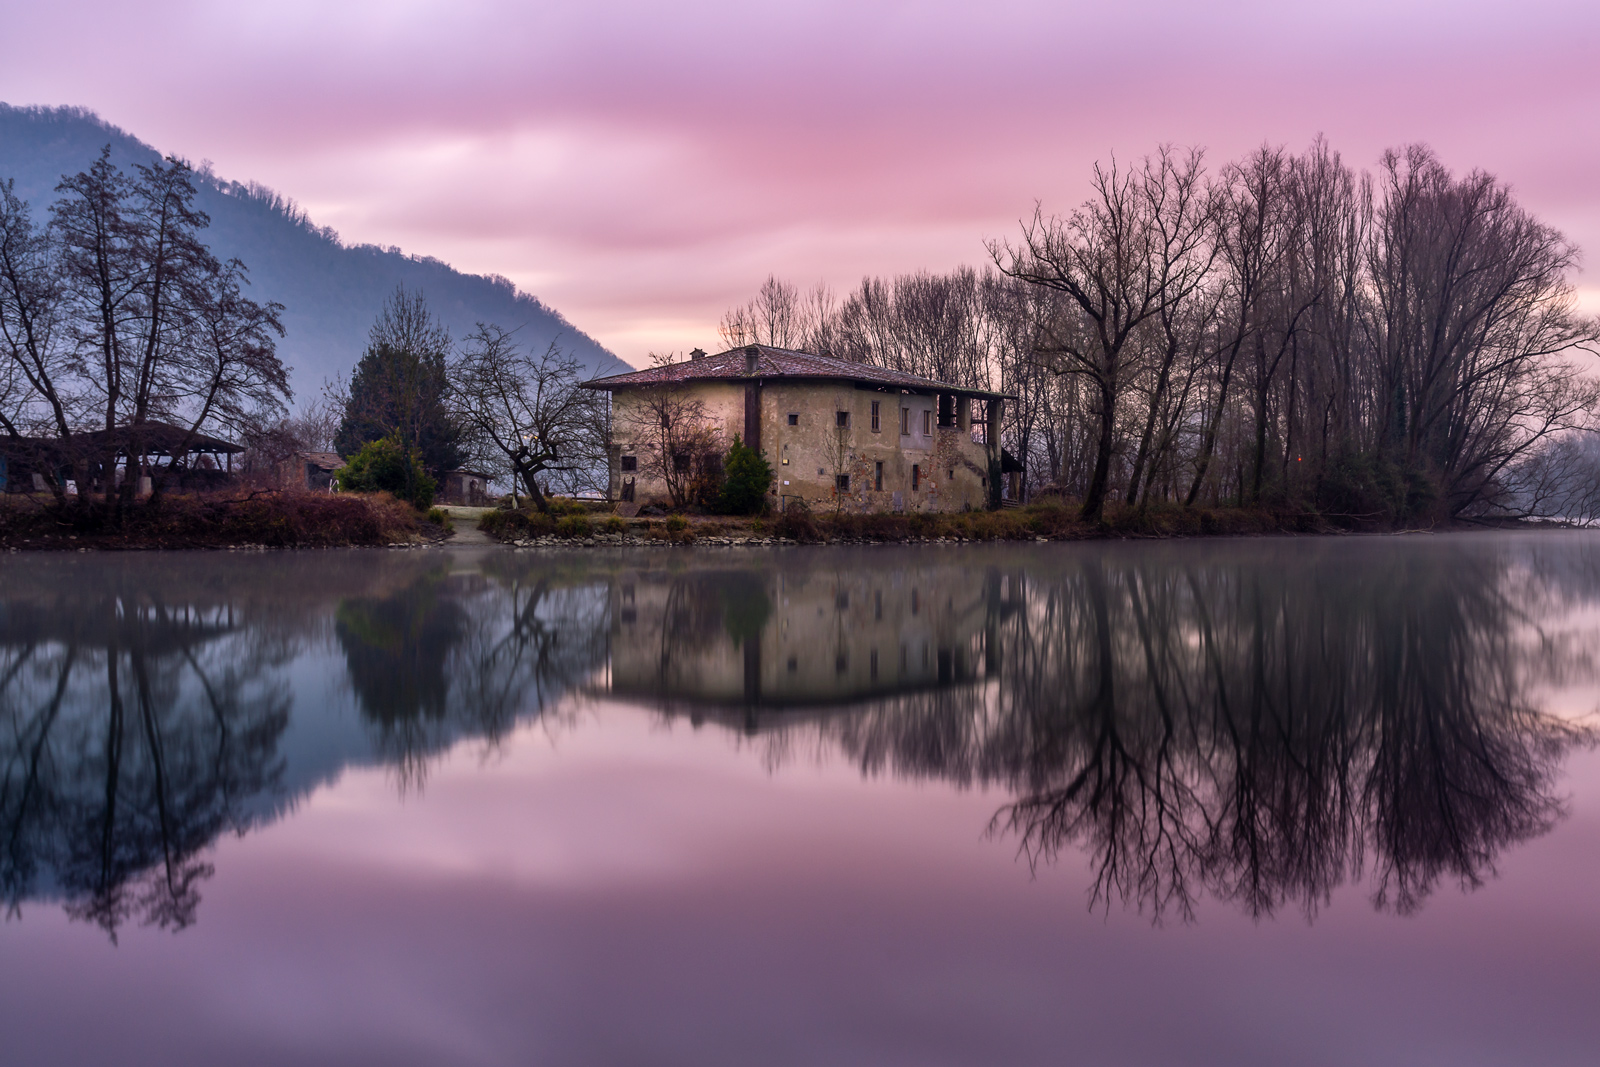 Dawn in Brivio...